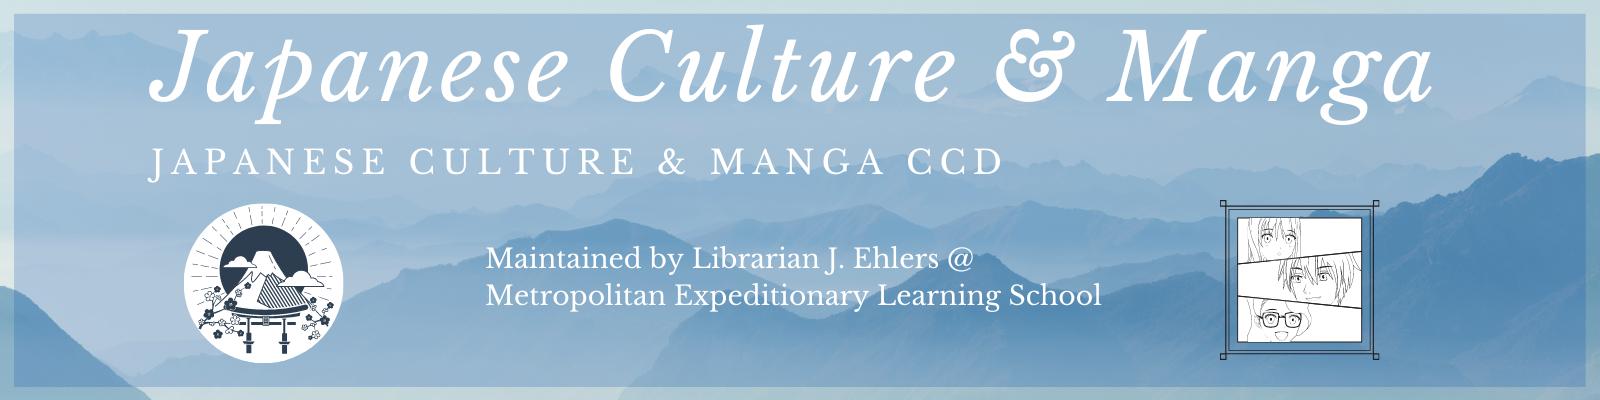 Japanese Culture & Manga